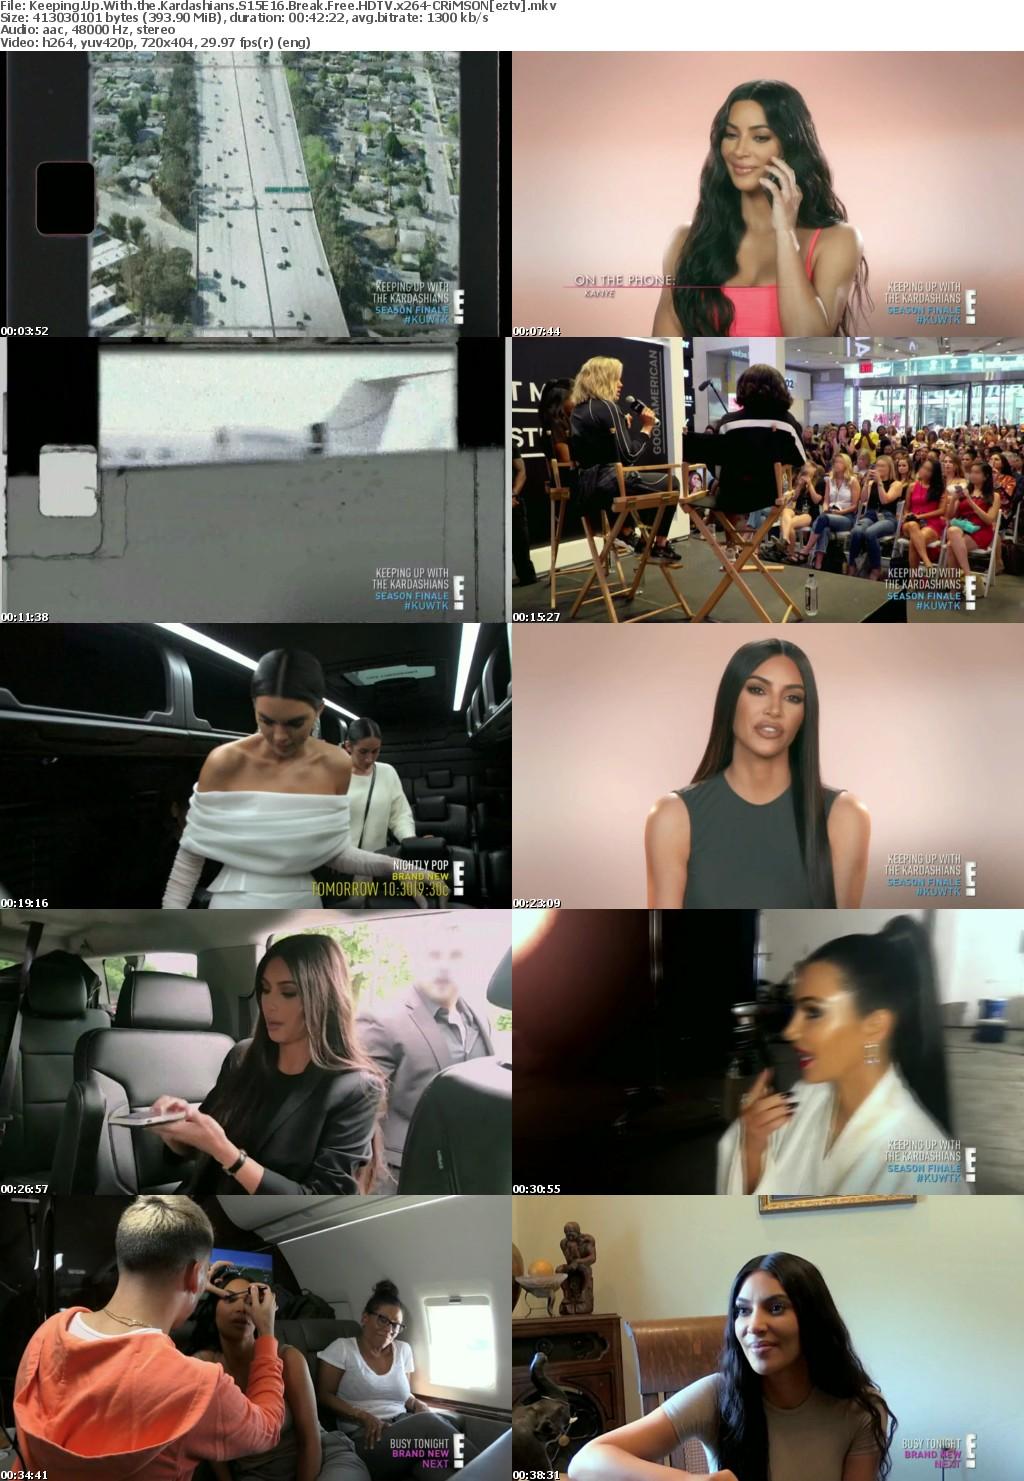 Keeping Up With the Kardashians S15E16 Break Free HDTV x264-CRiMSON